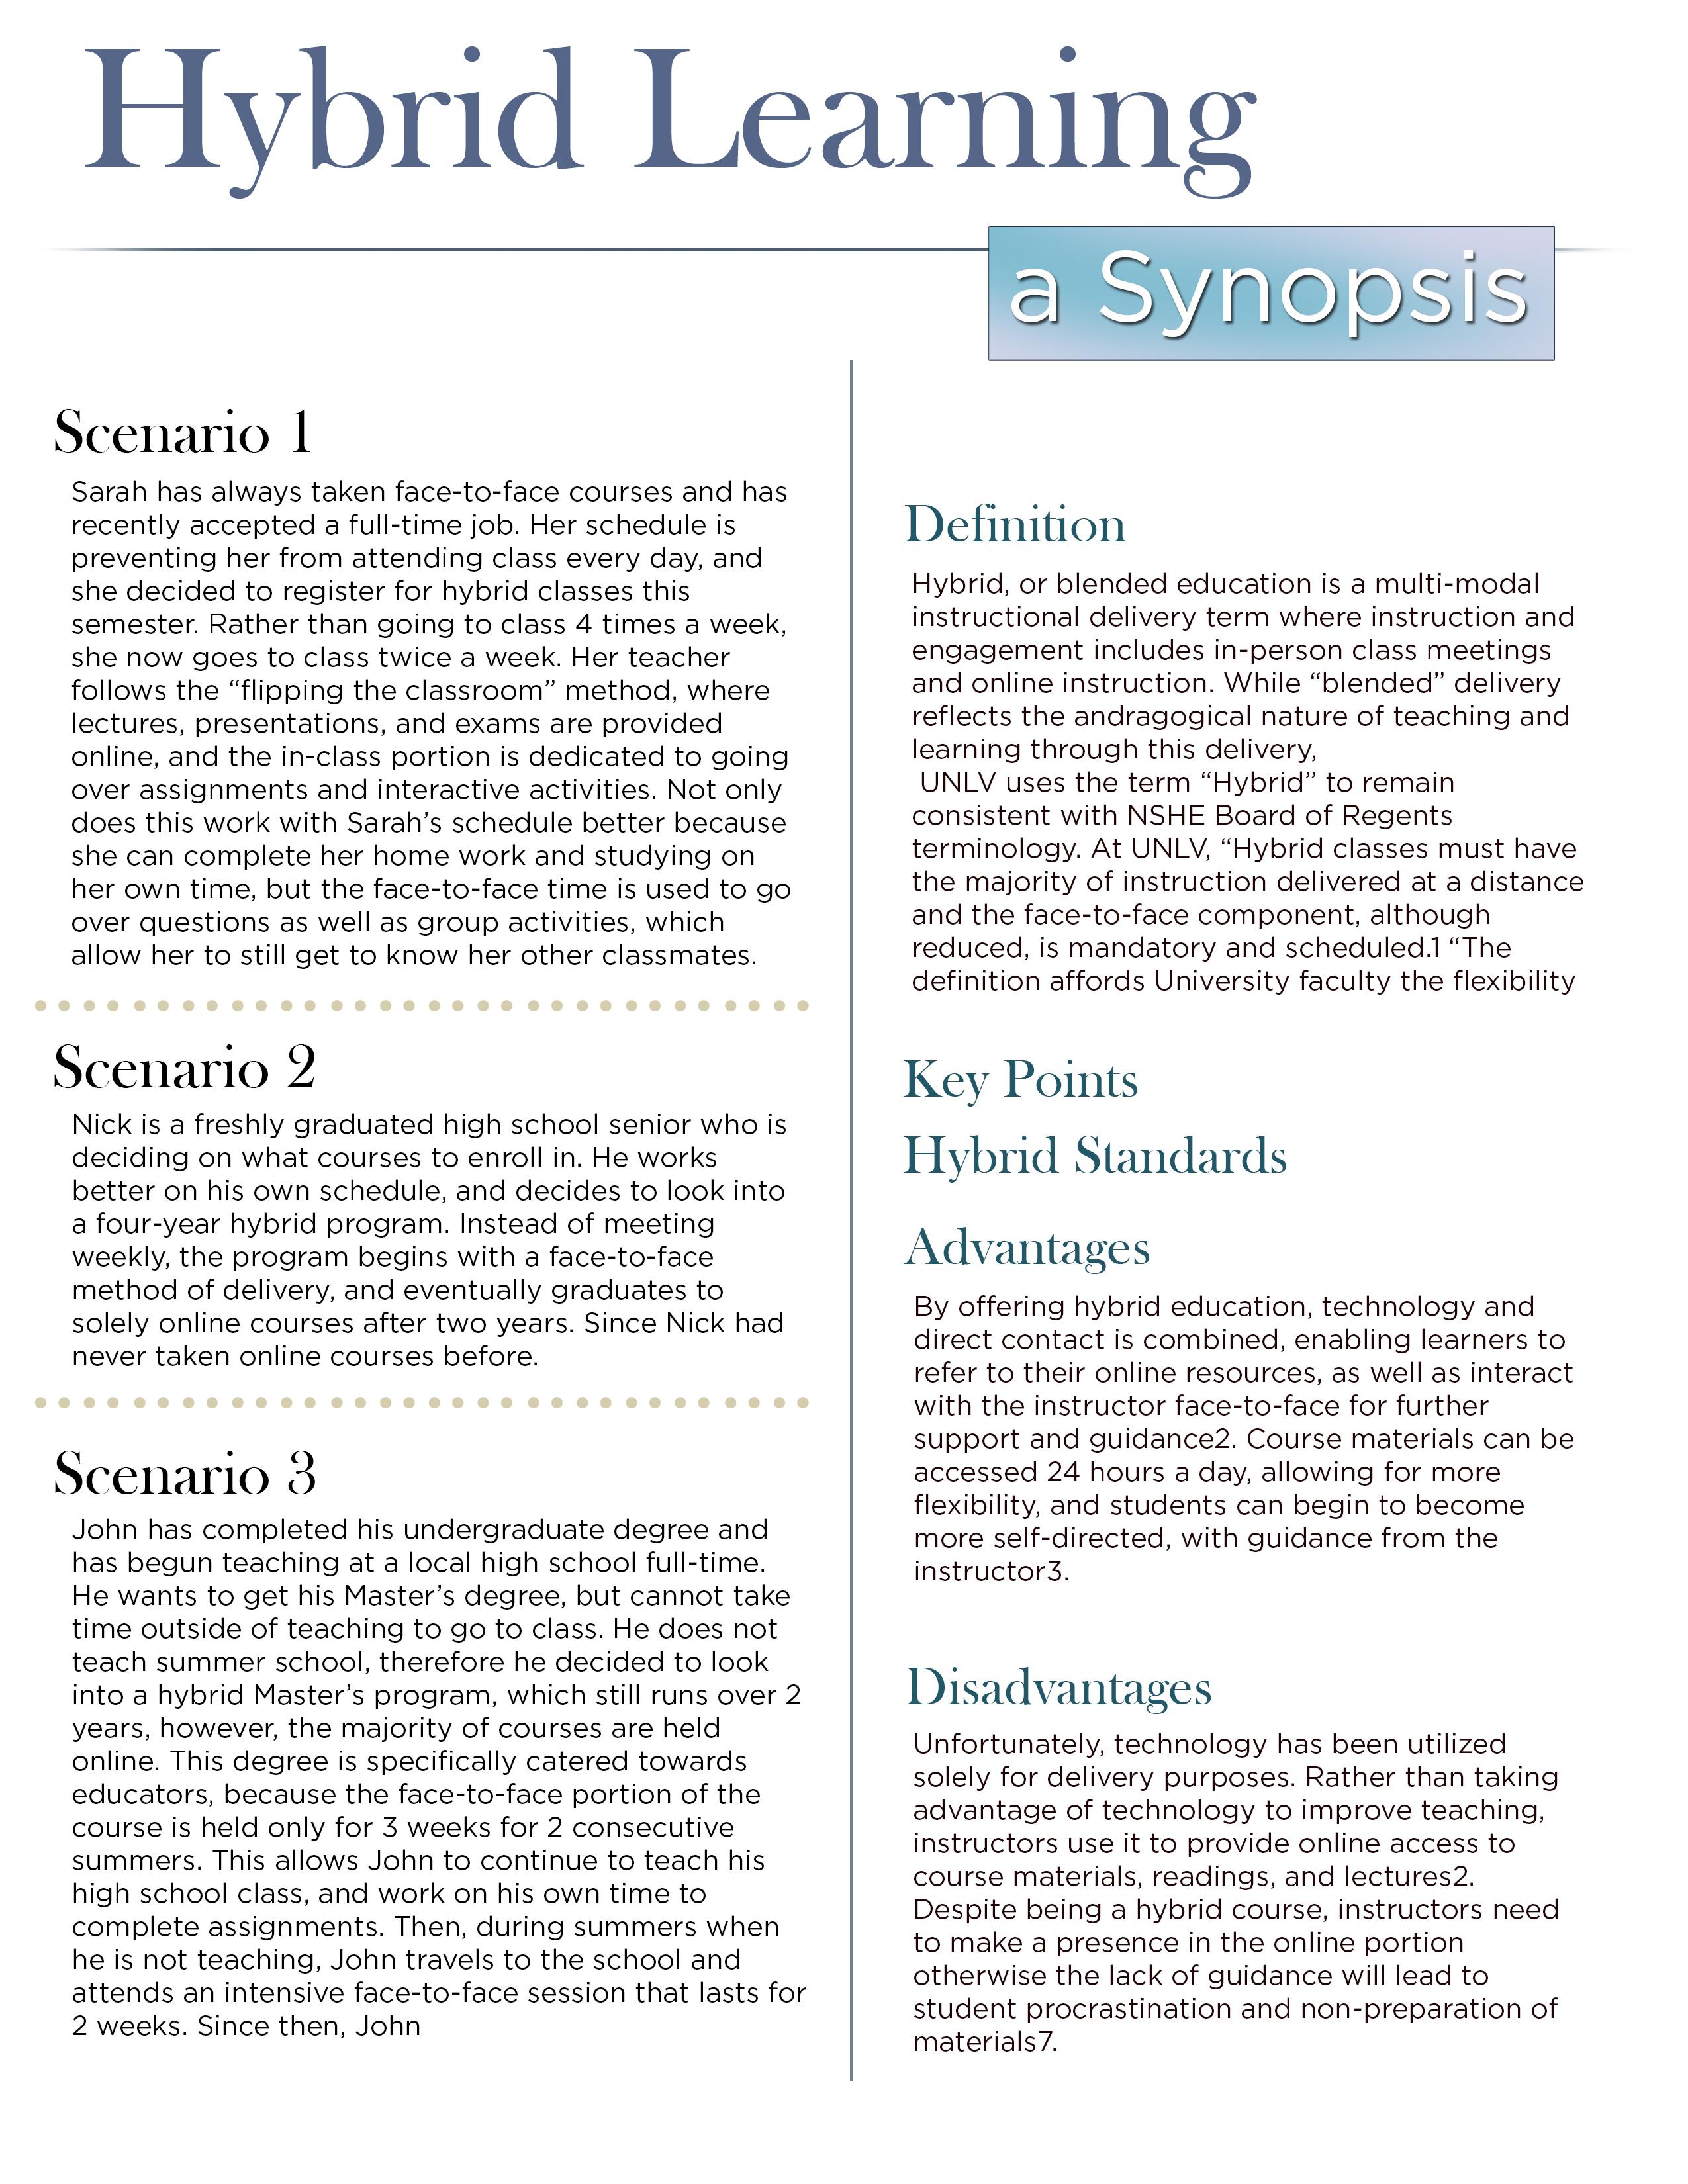 Hybrid Learning by Jon Apisa